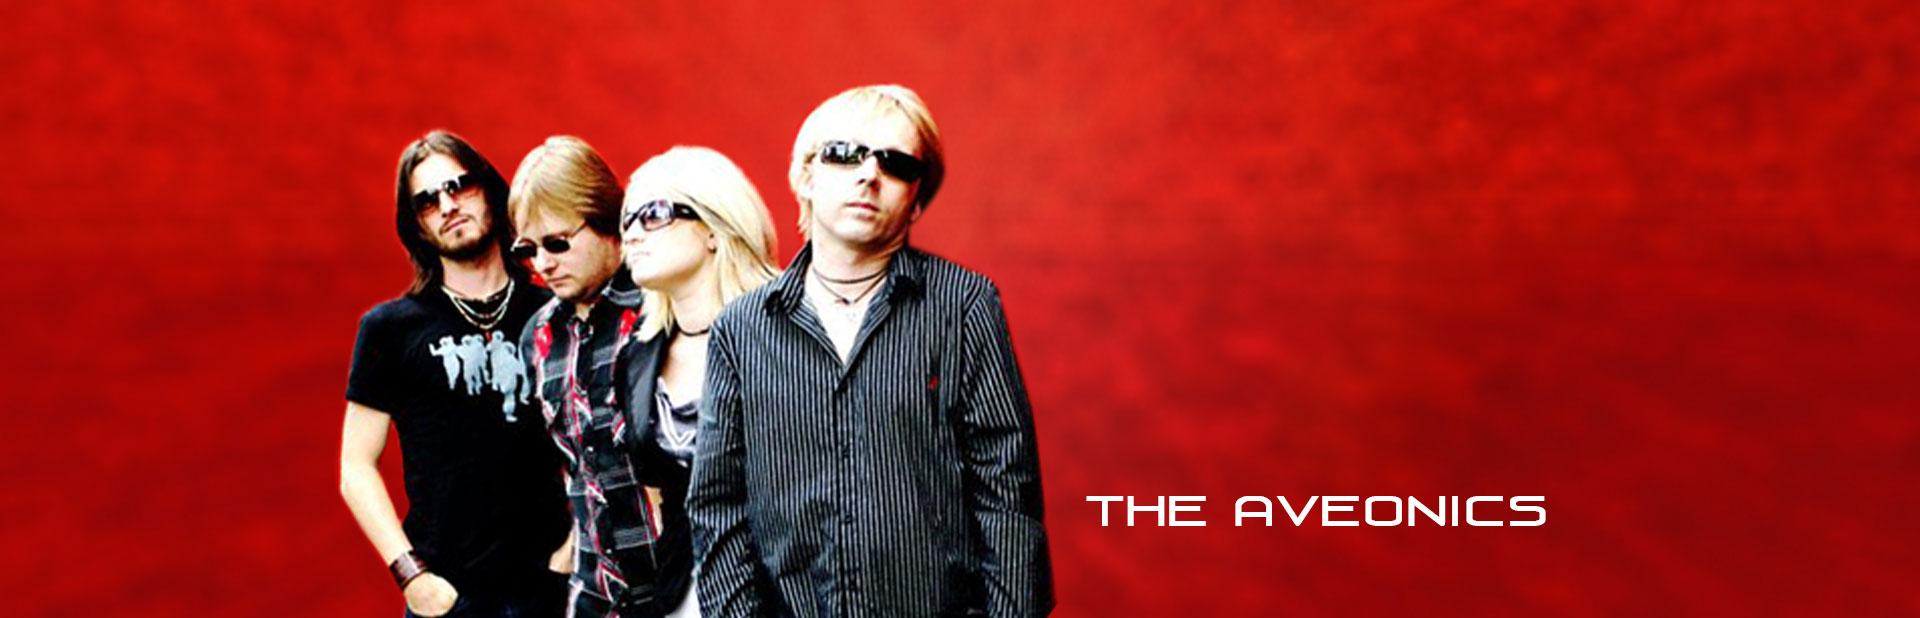 The Aveonics